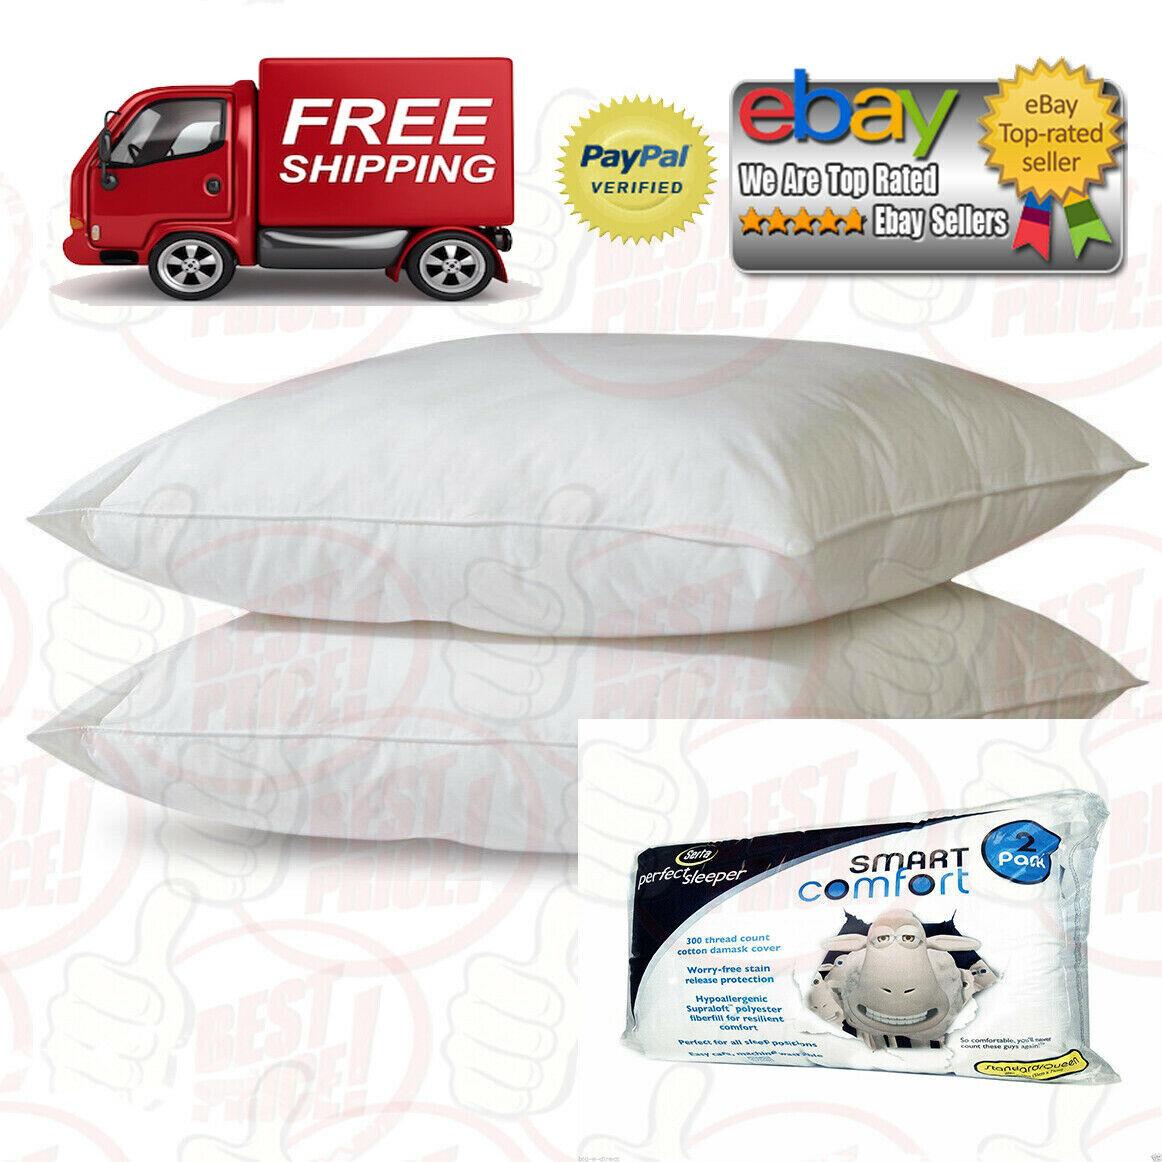 2 Serta Perfect Sleeper Queen Size Bed Pillows Soft Cotton C